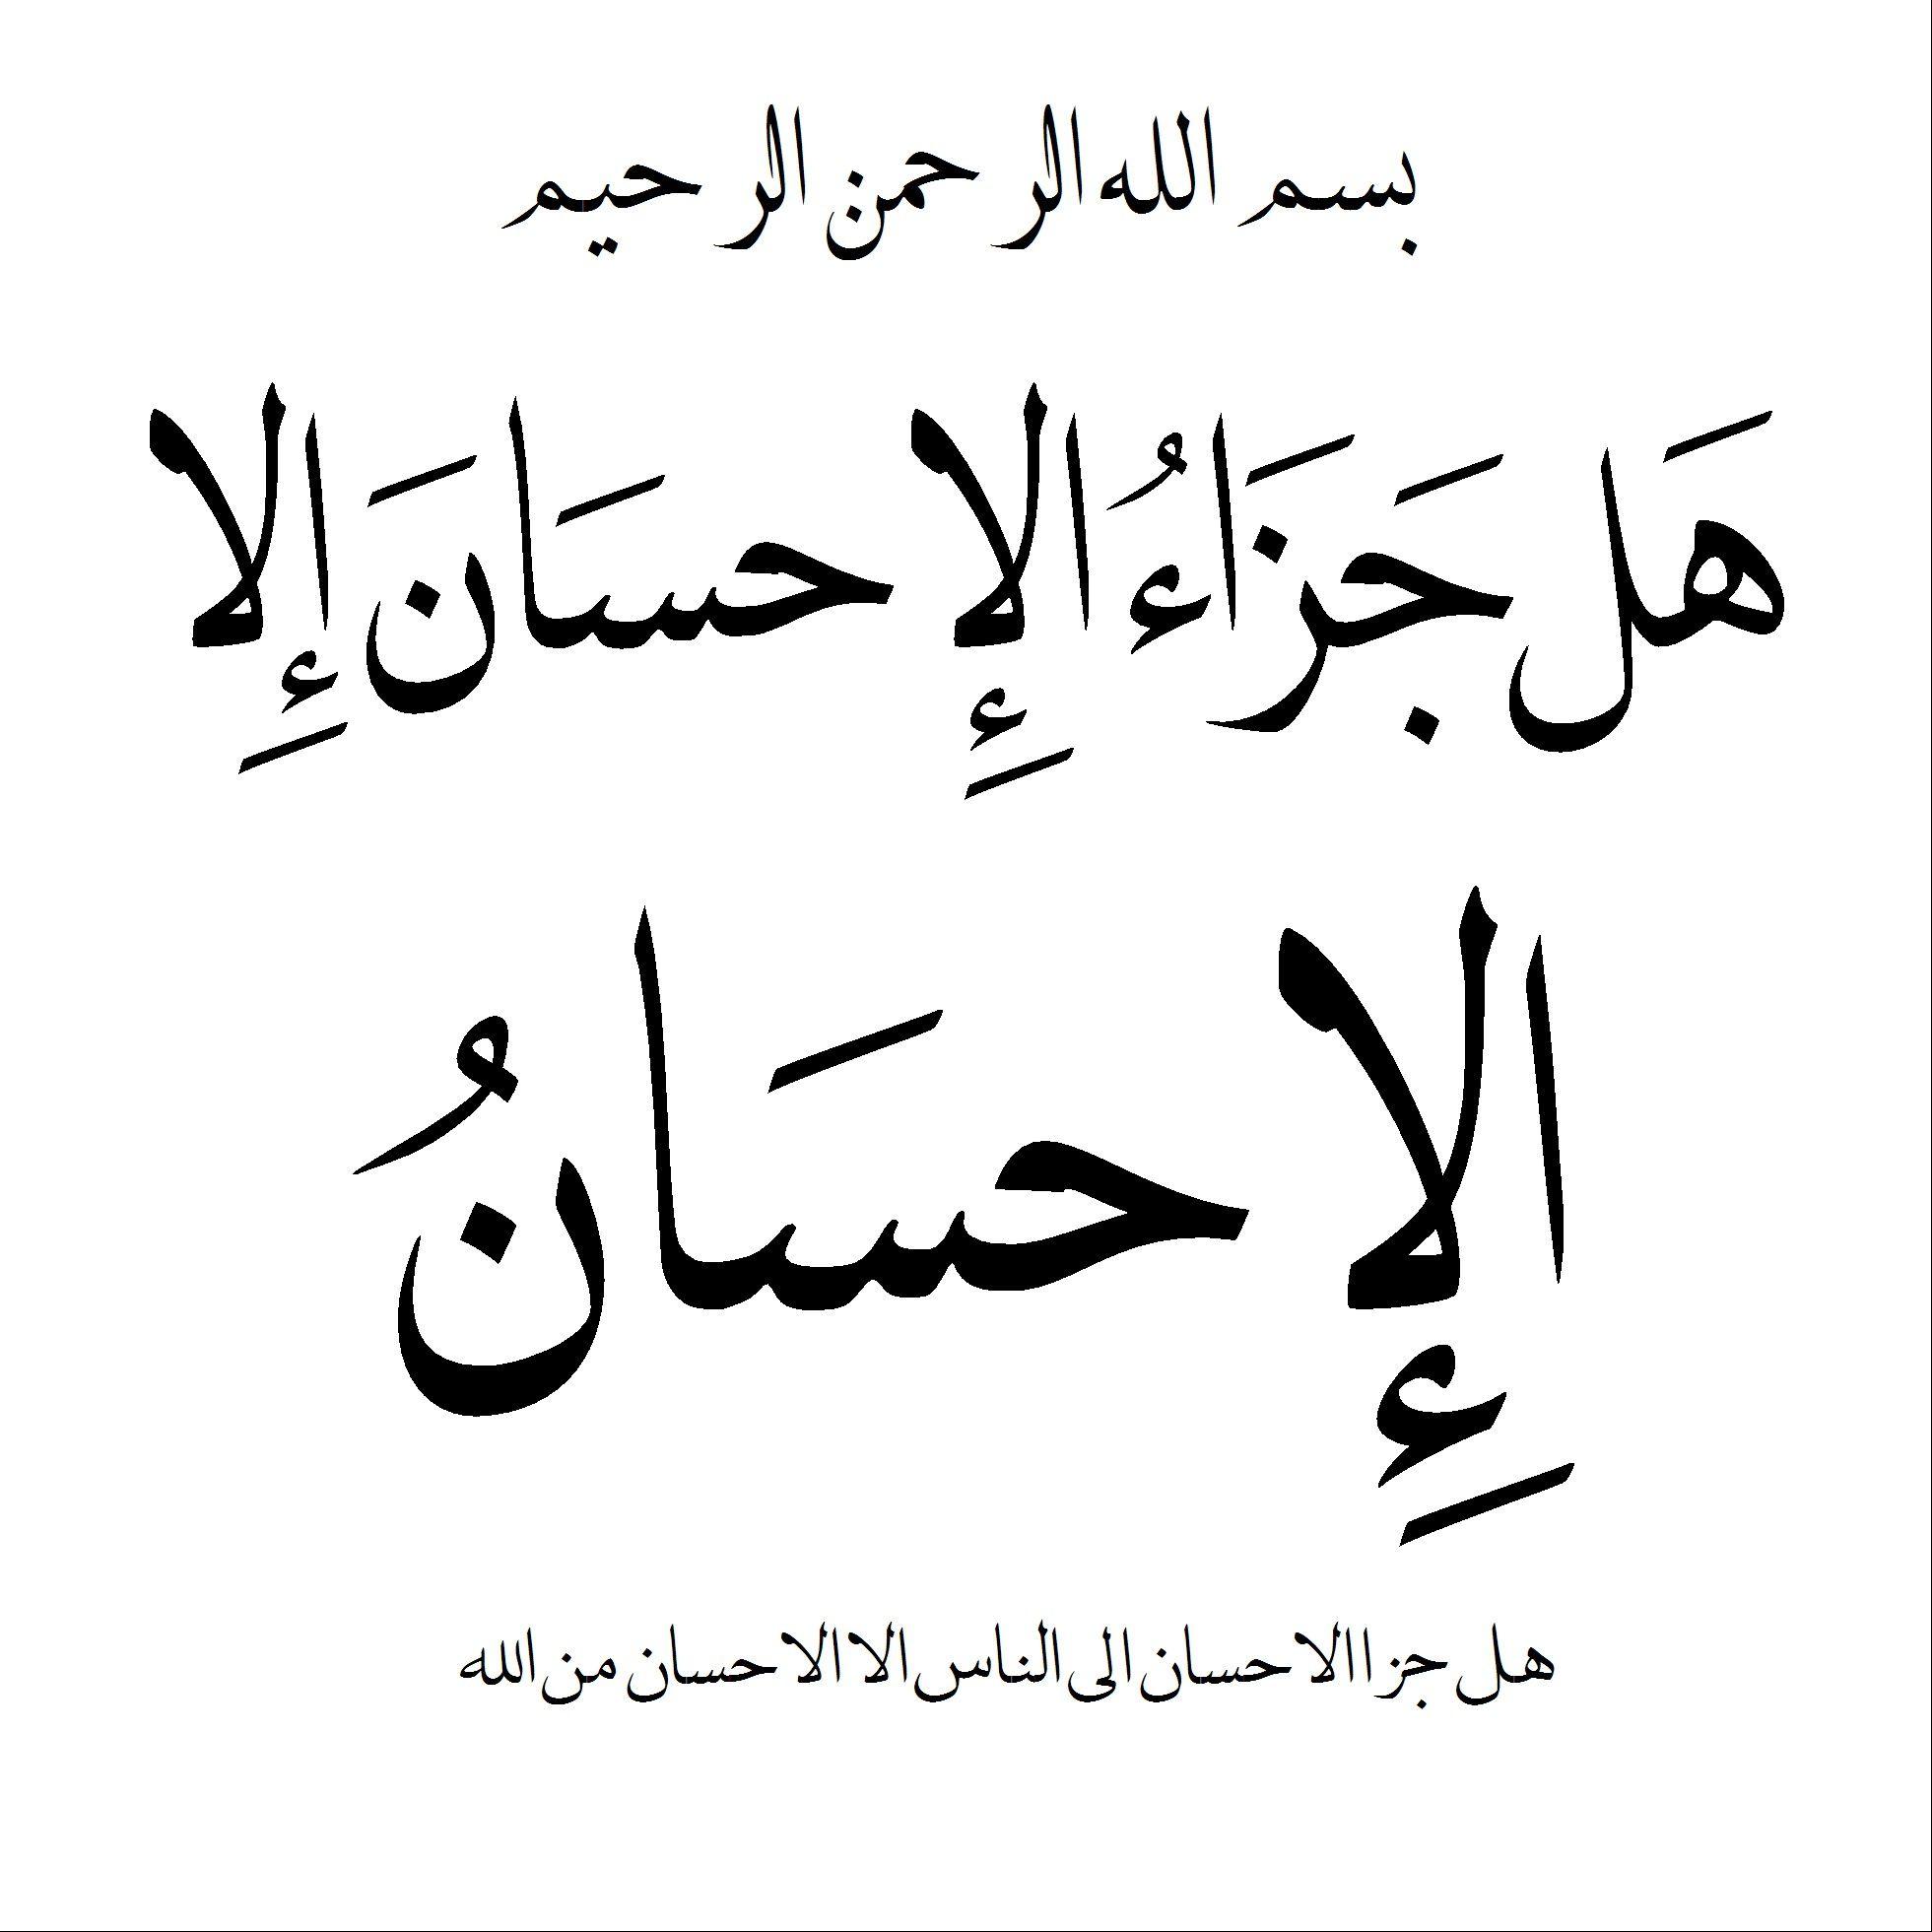 الاحسان Quran Verses Islamic Calligraphy Quran Quran Quotes